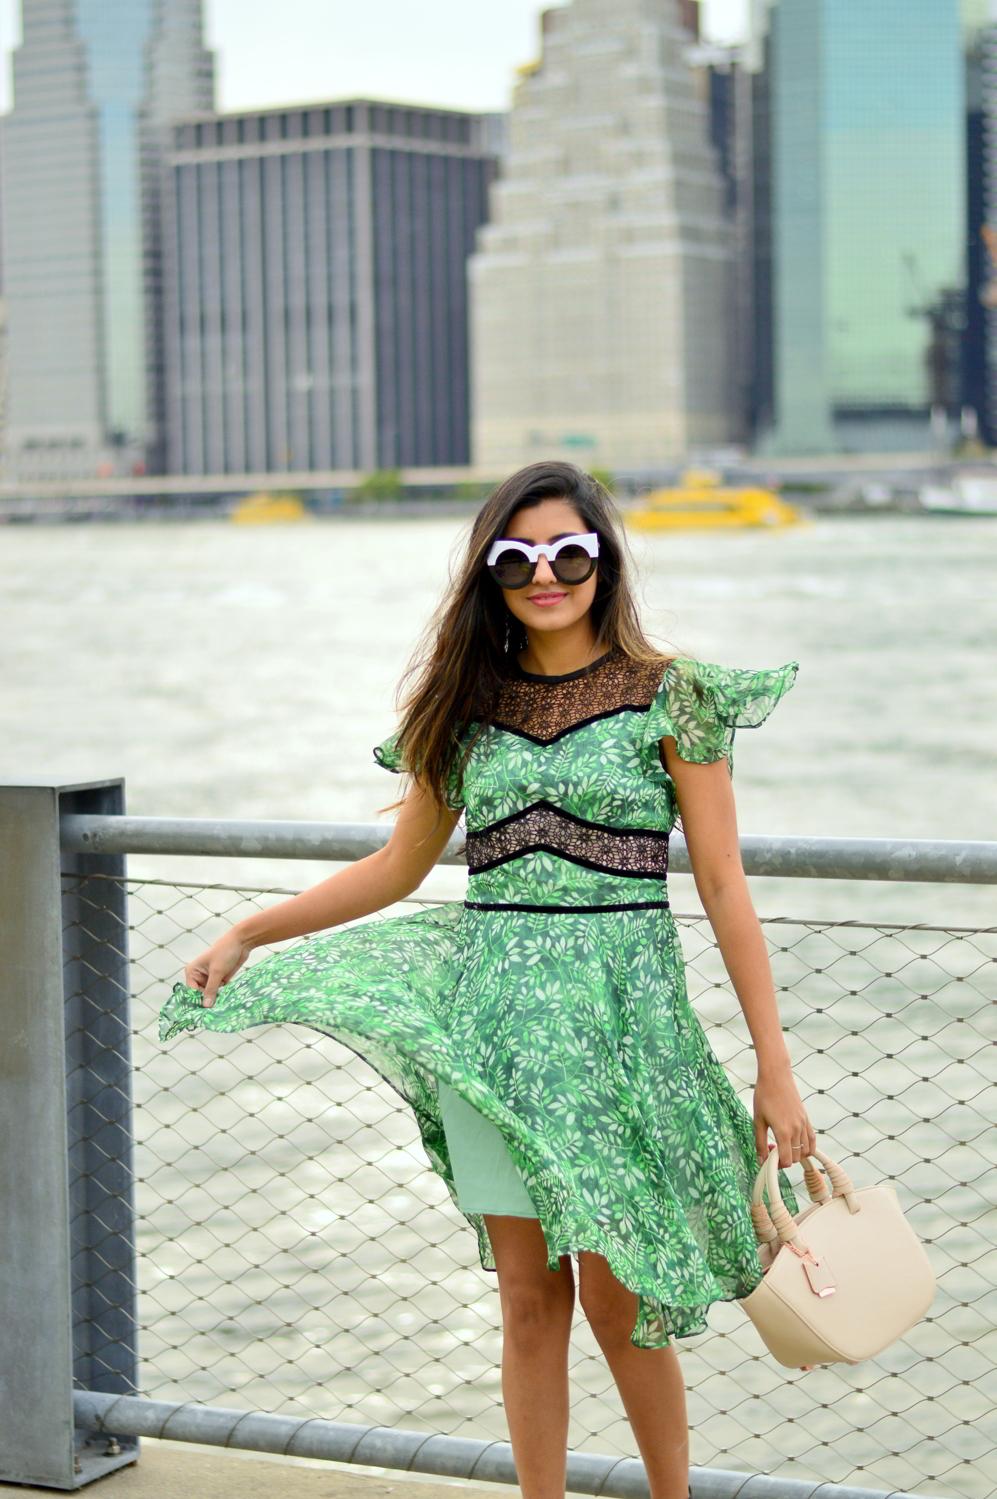 green-leaf-print-summer-sundress-brooklyn-bridge-nyc-blogger-outfit 2